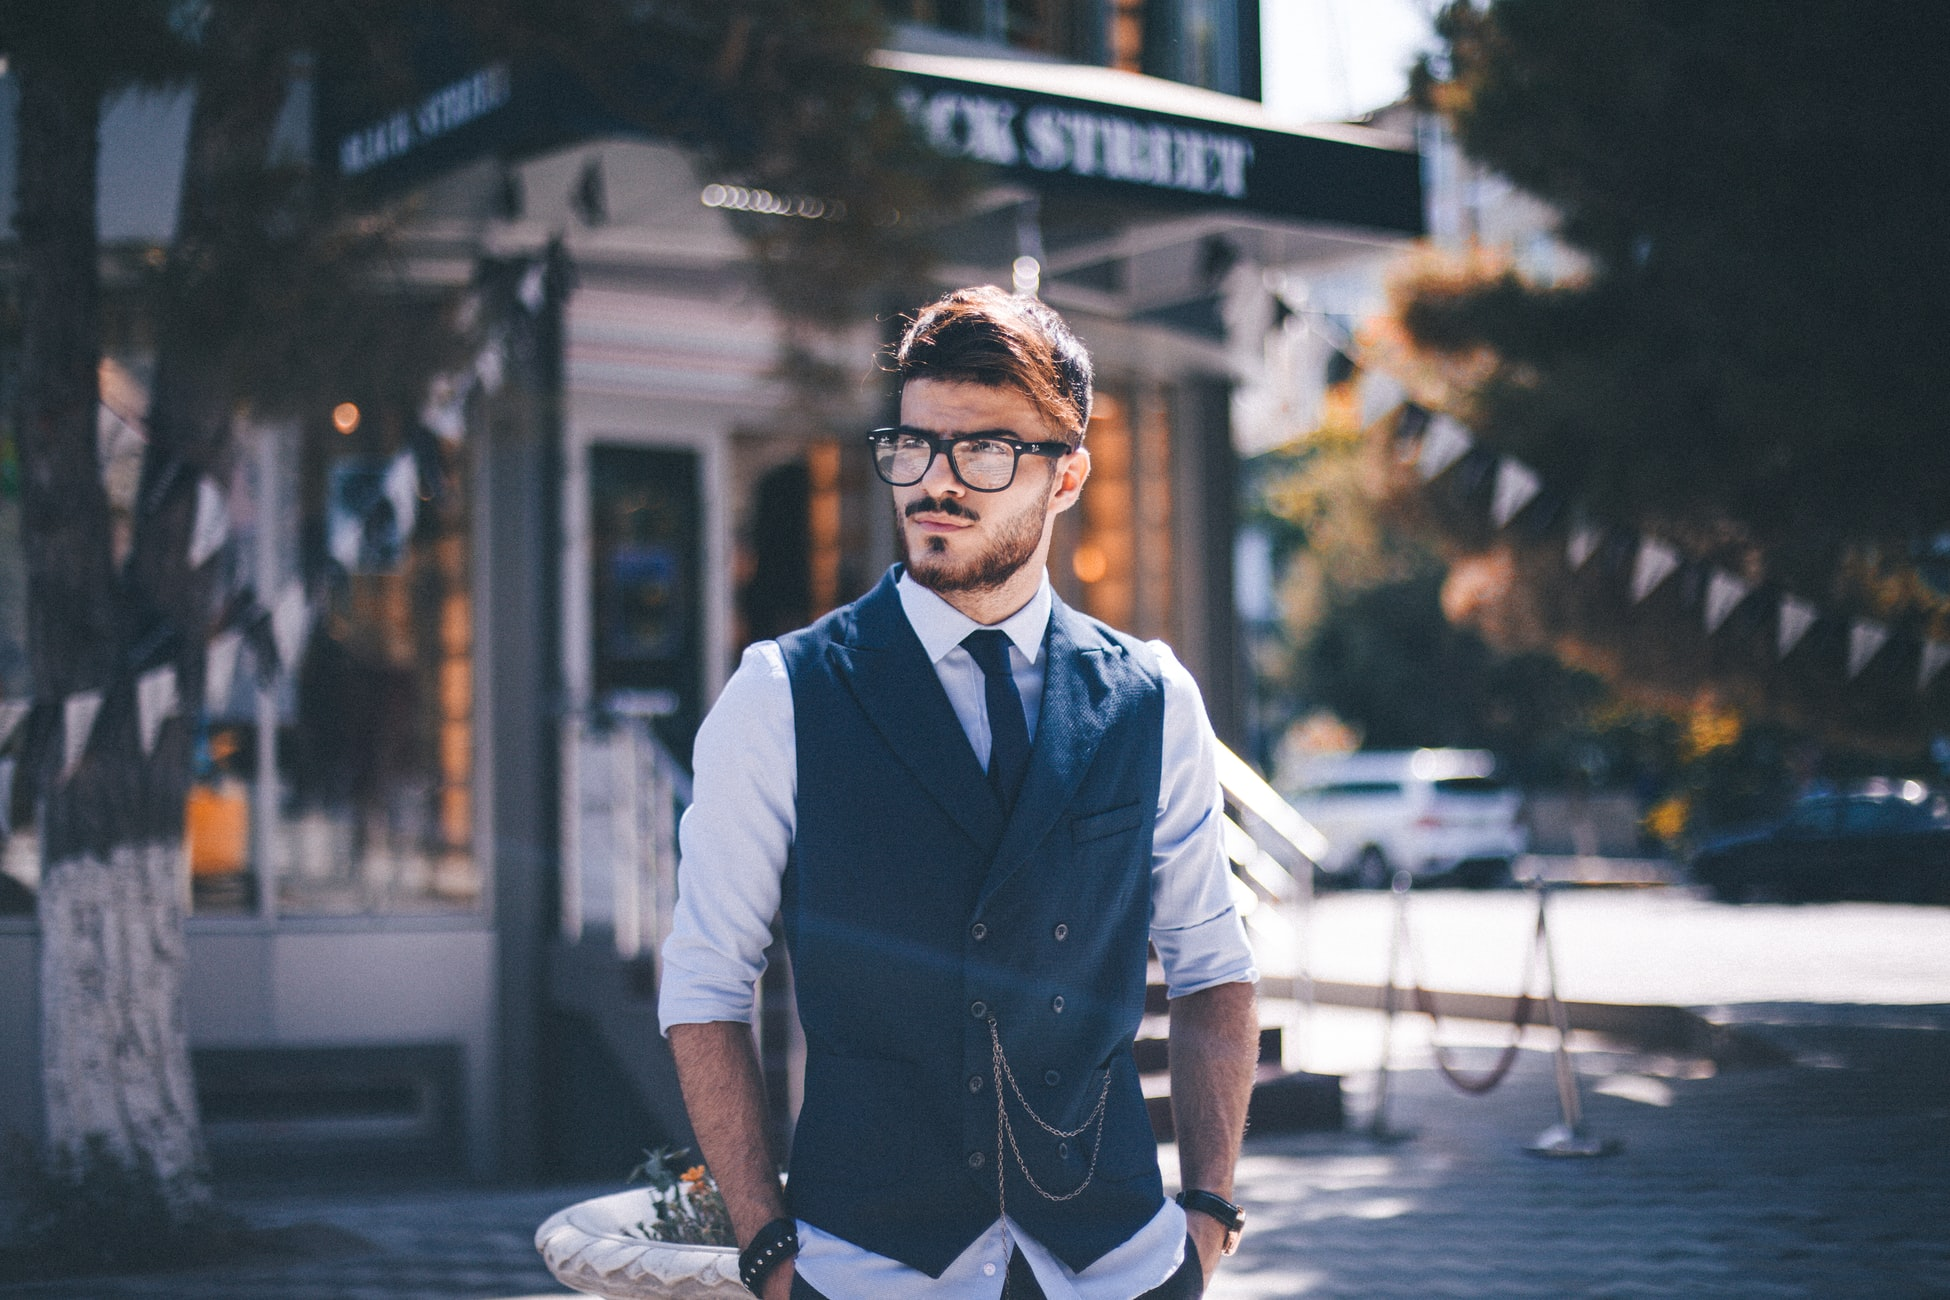 portrait photography poses male